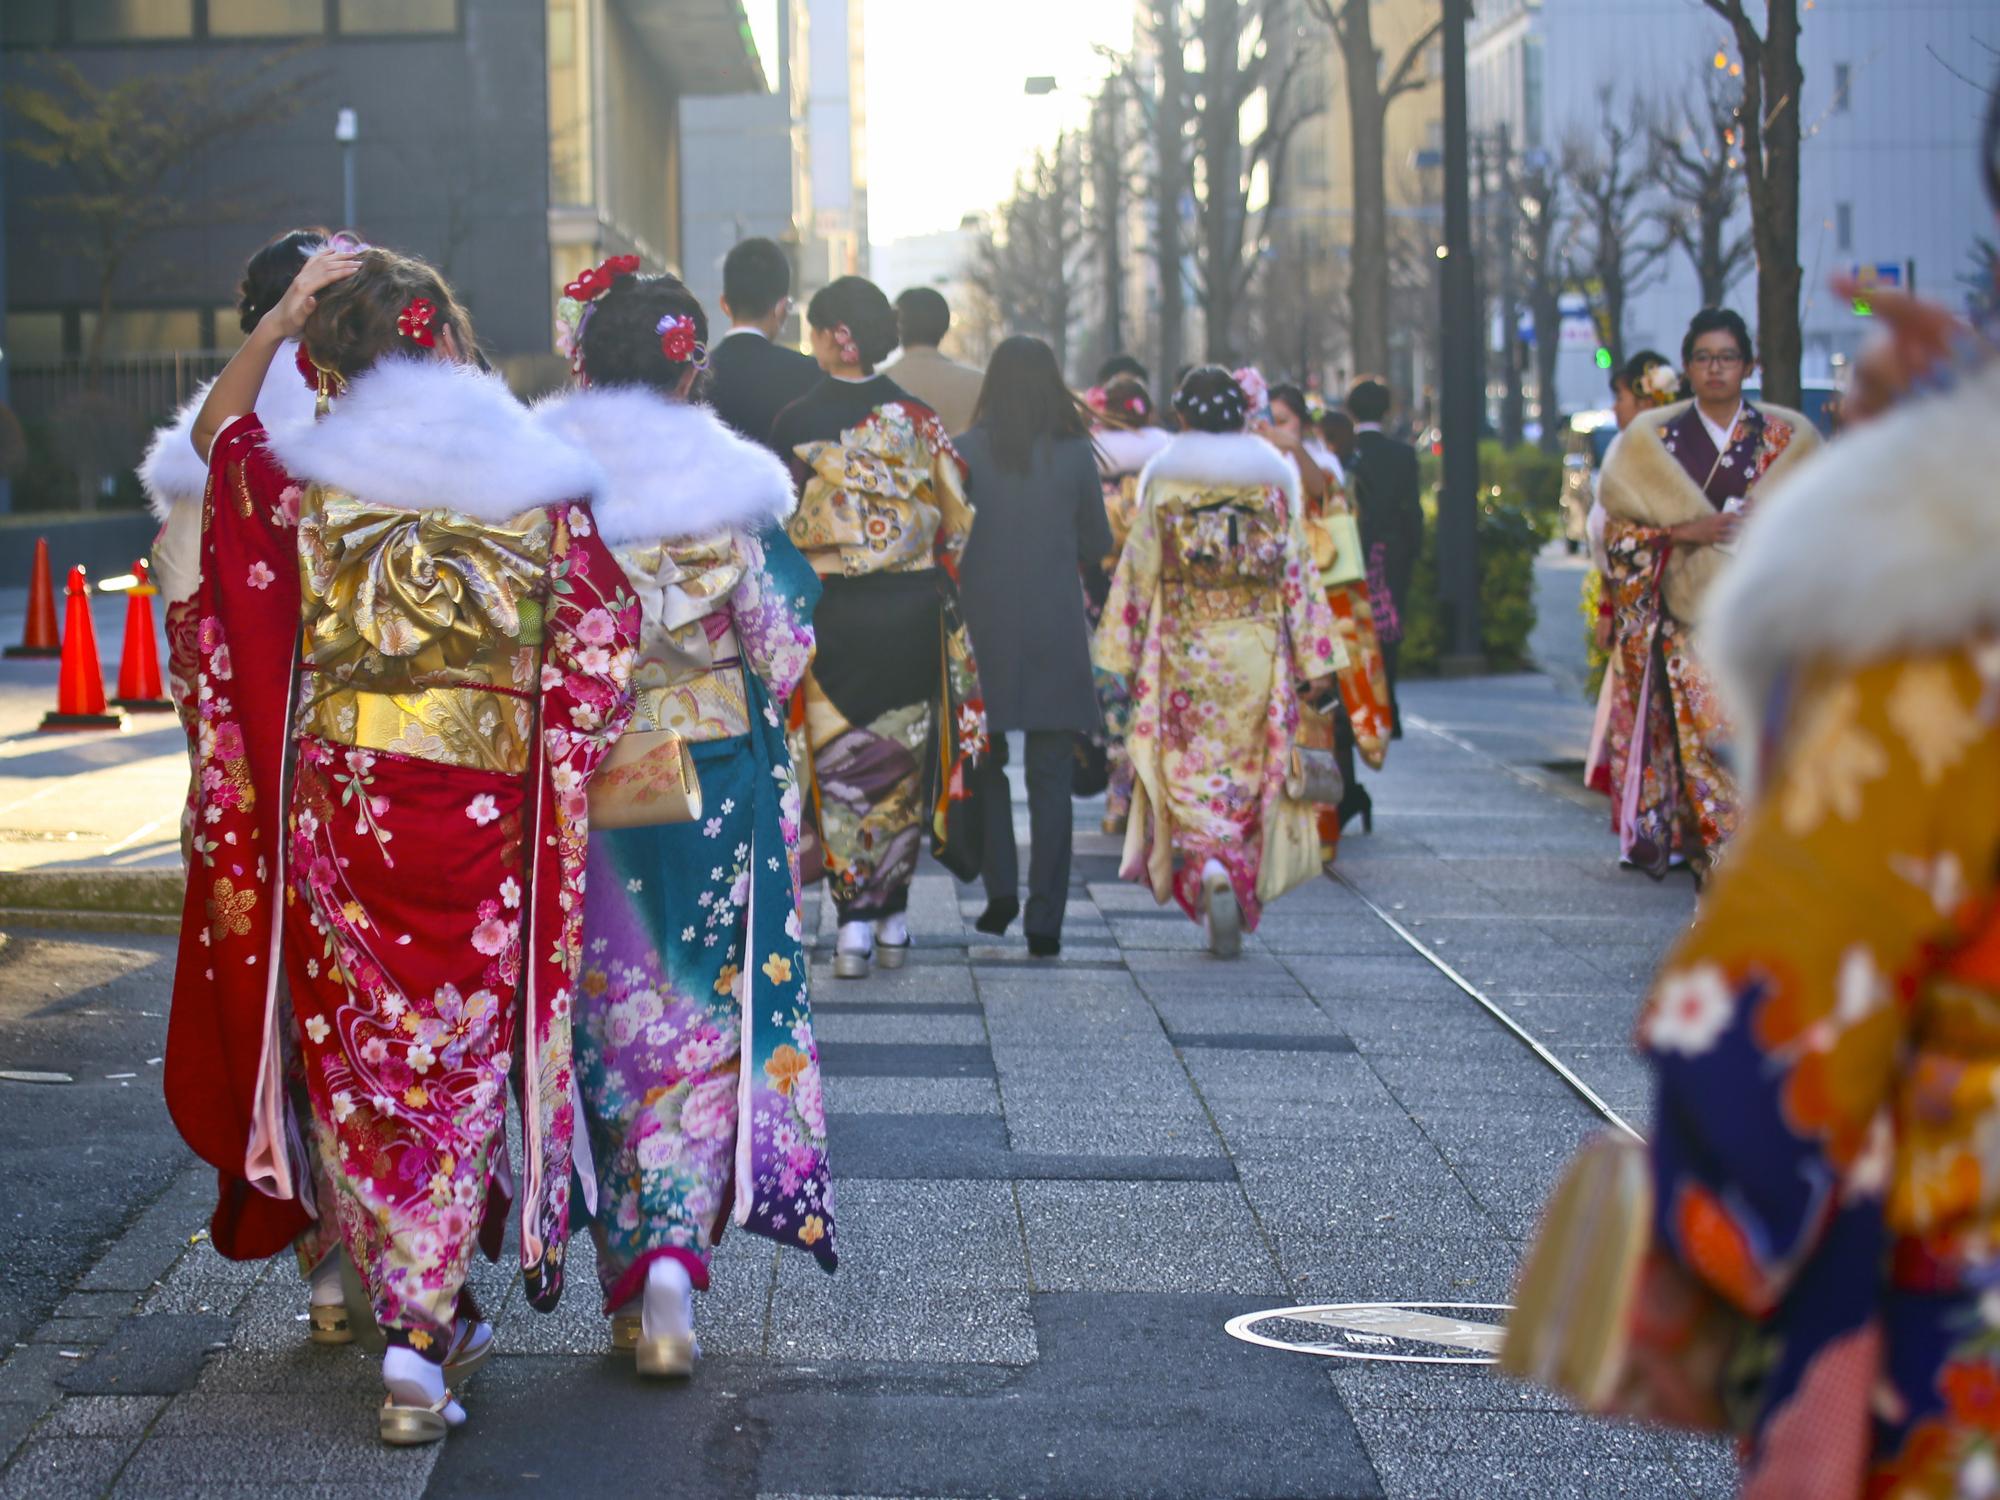 Kimono Fashion With A Twist